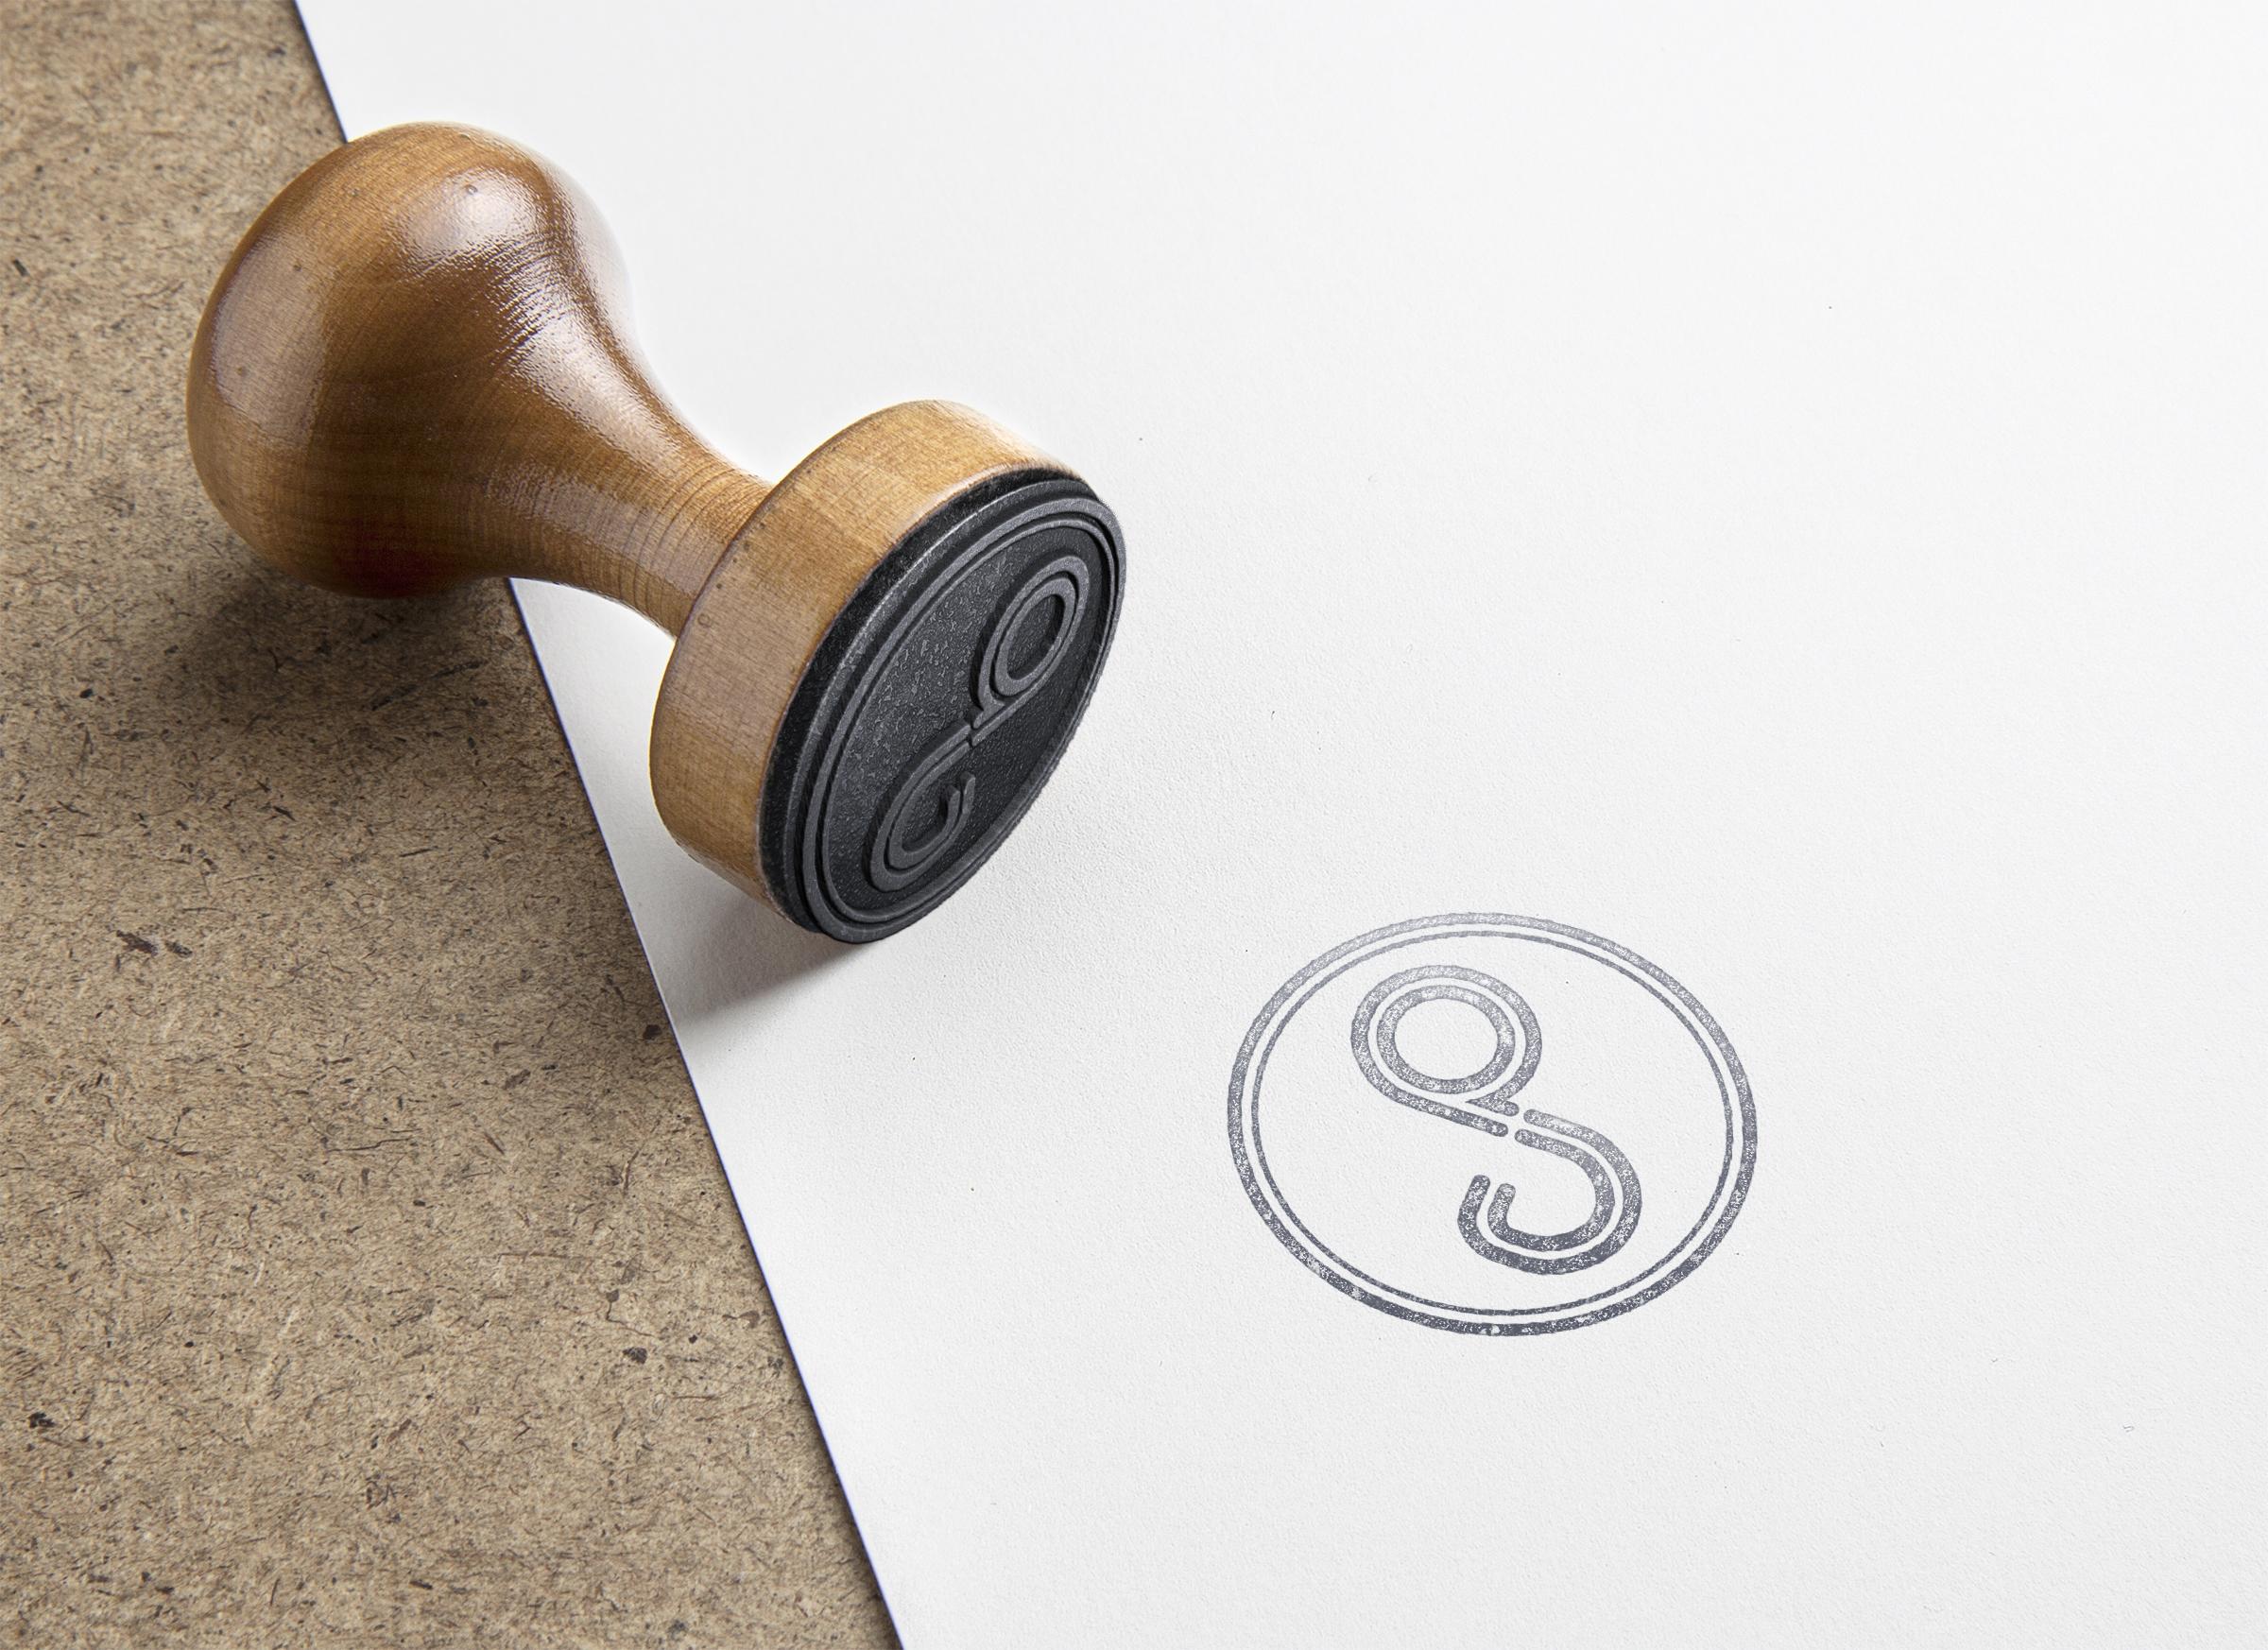 QG Rubber Stamp.jpg